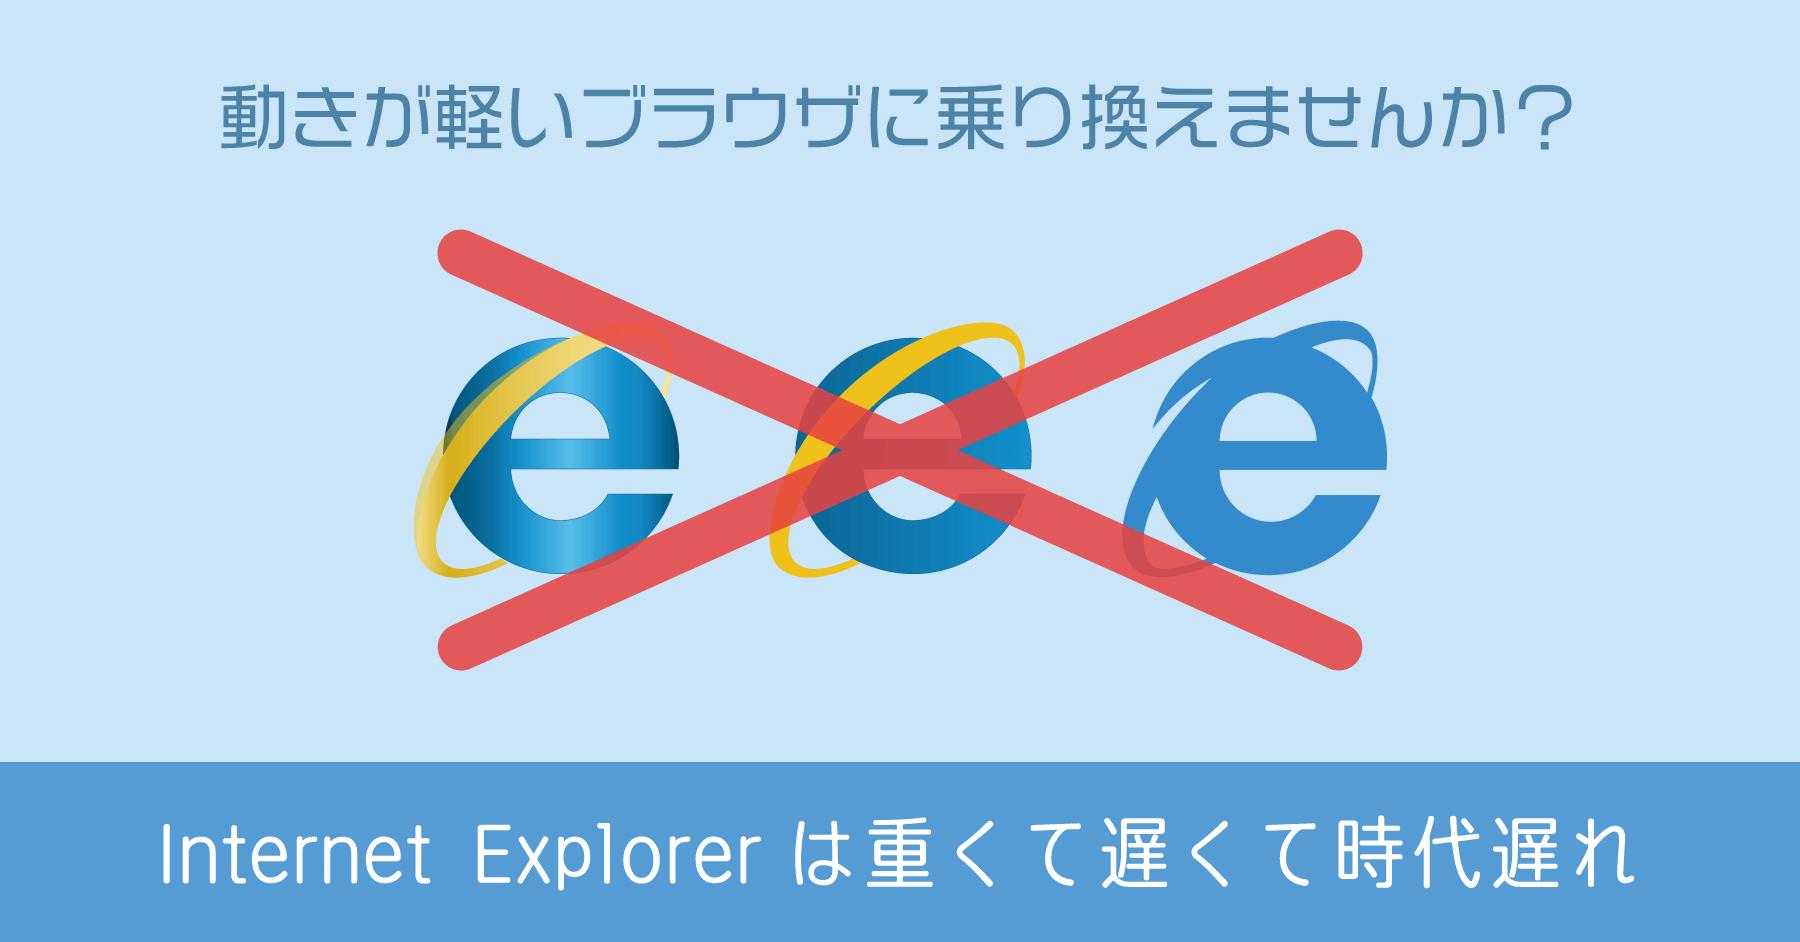 Internet Explorer は重くて遅くて時代遅れのブラウザ